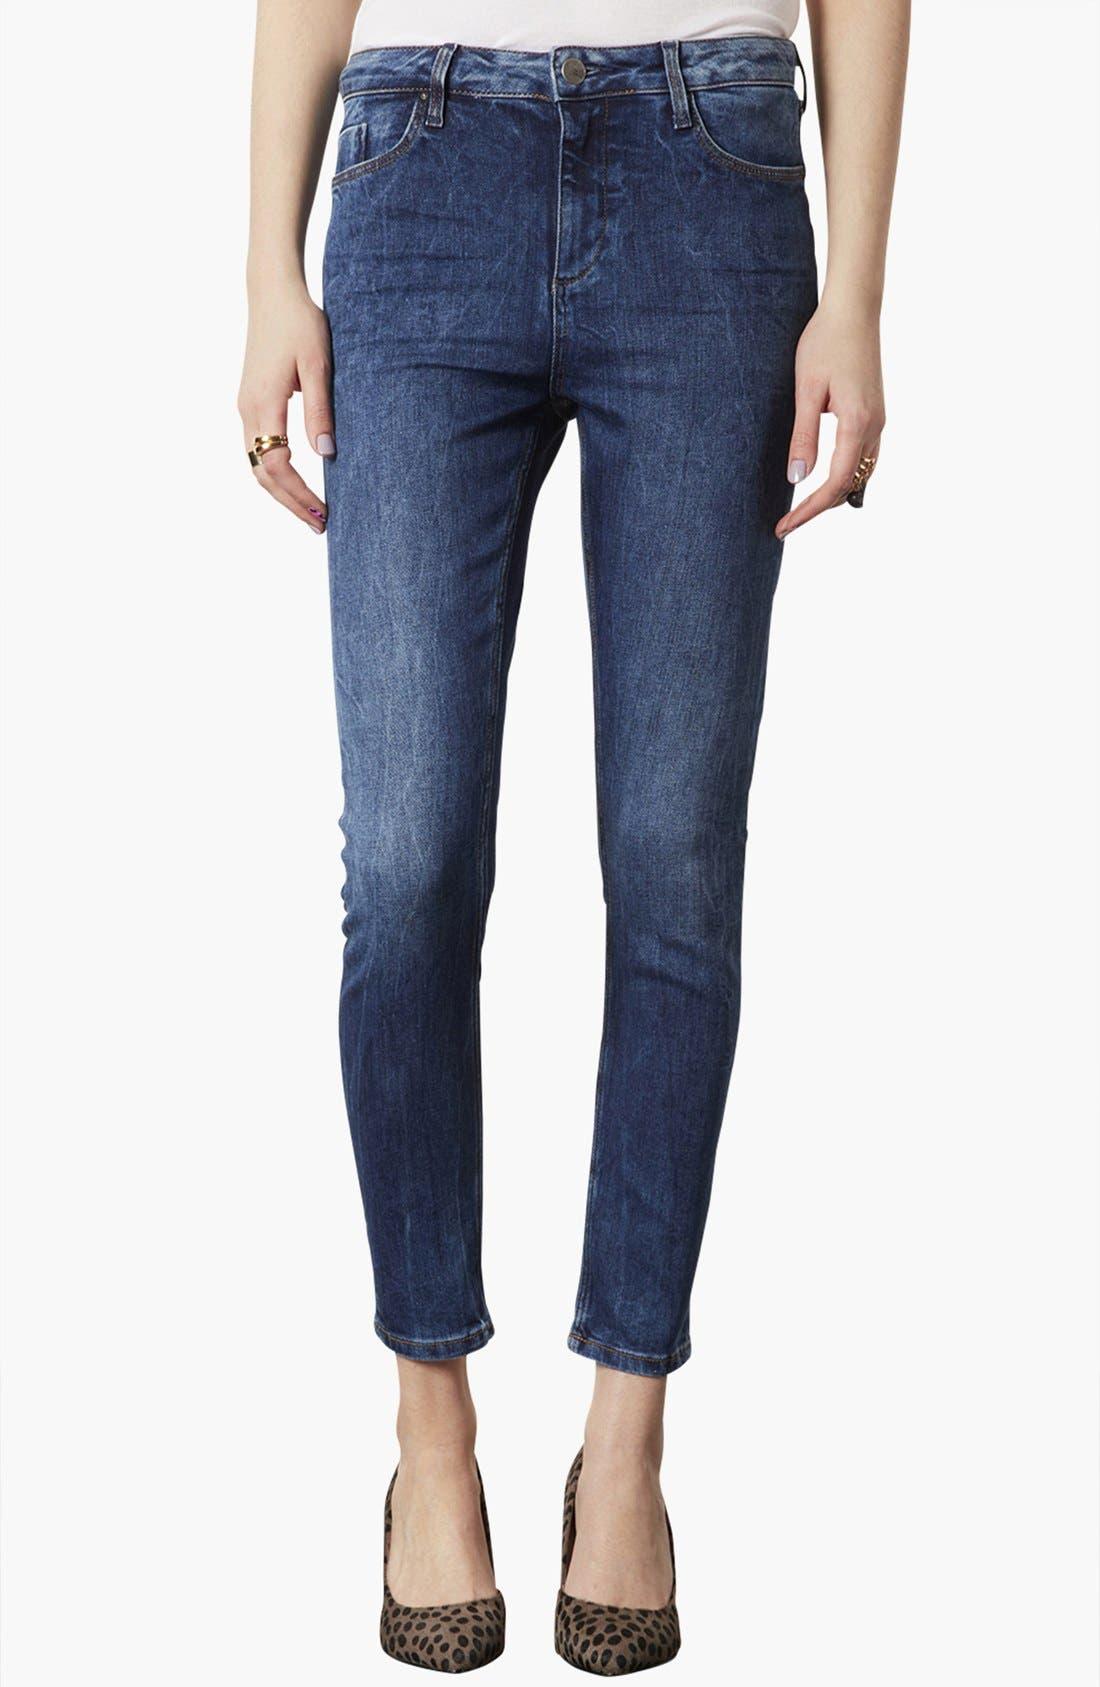 Alternate Image 1 Selected - Topshop 'Jamie' Skinny Jeans (Regular, Short & Long)